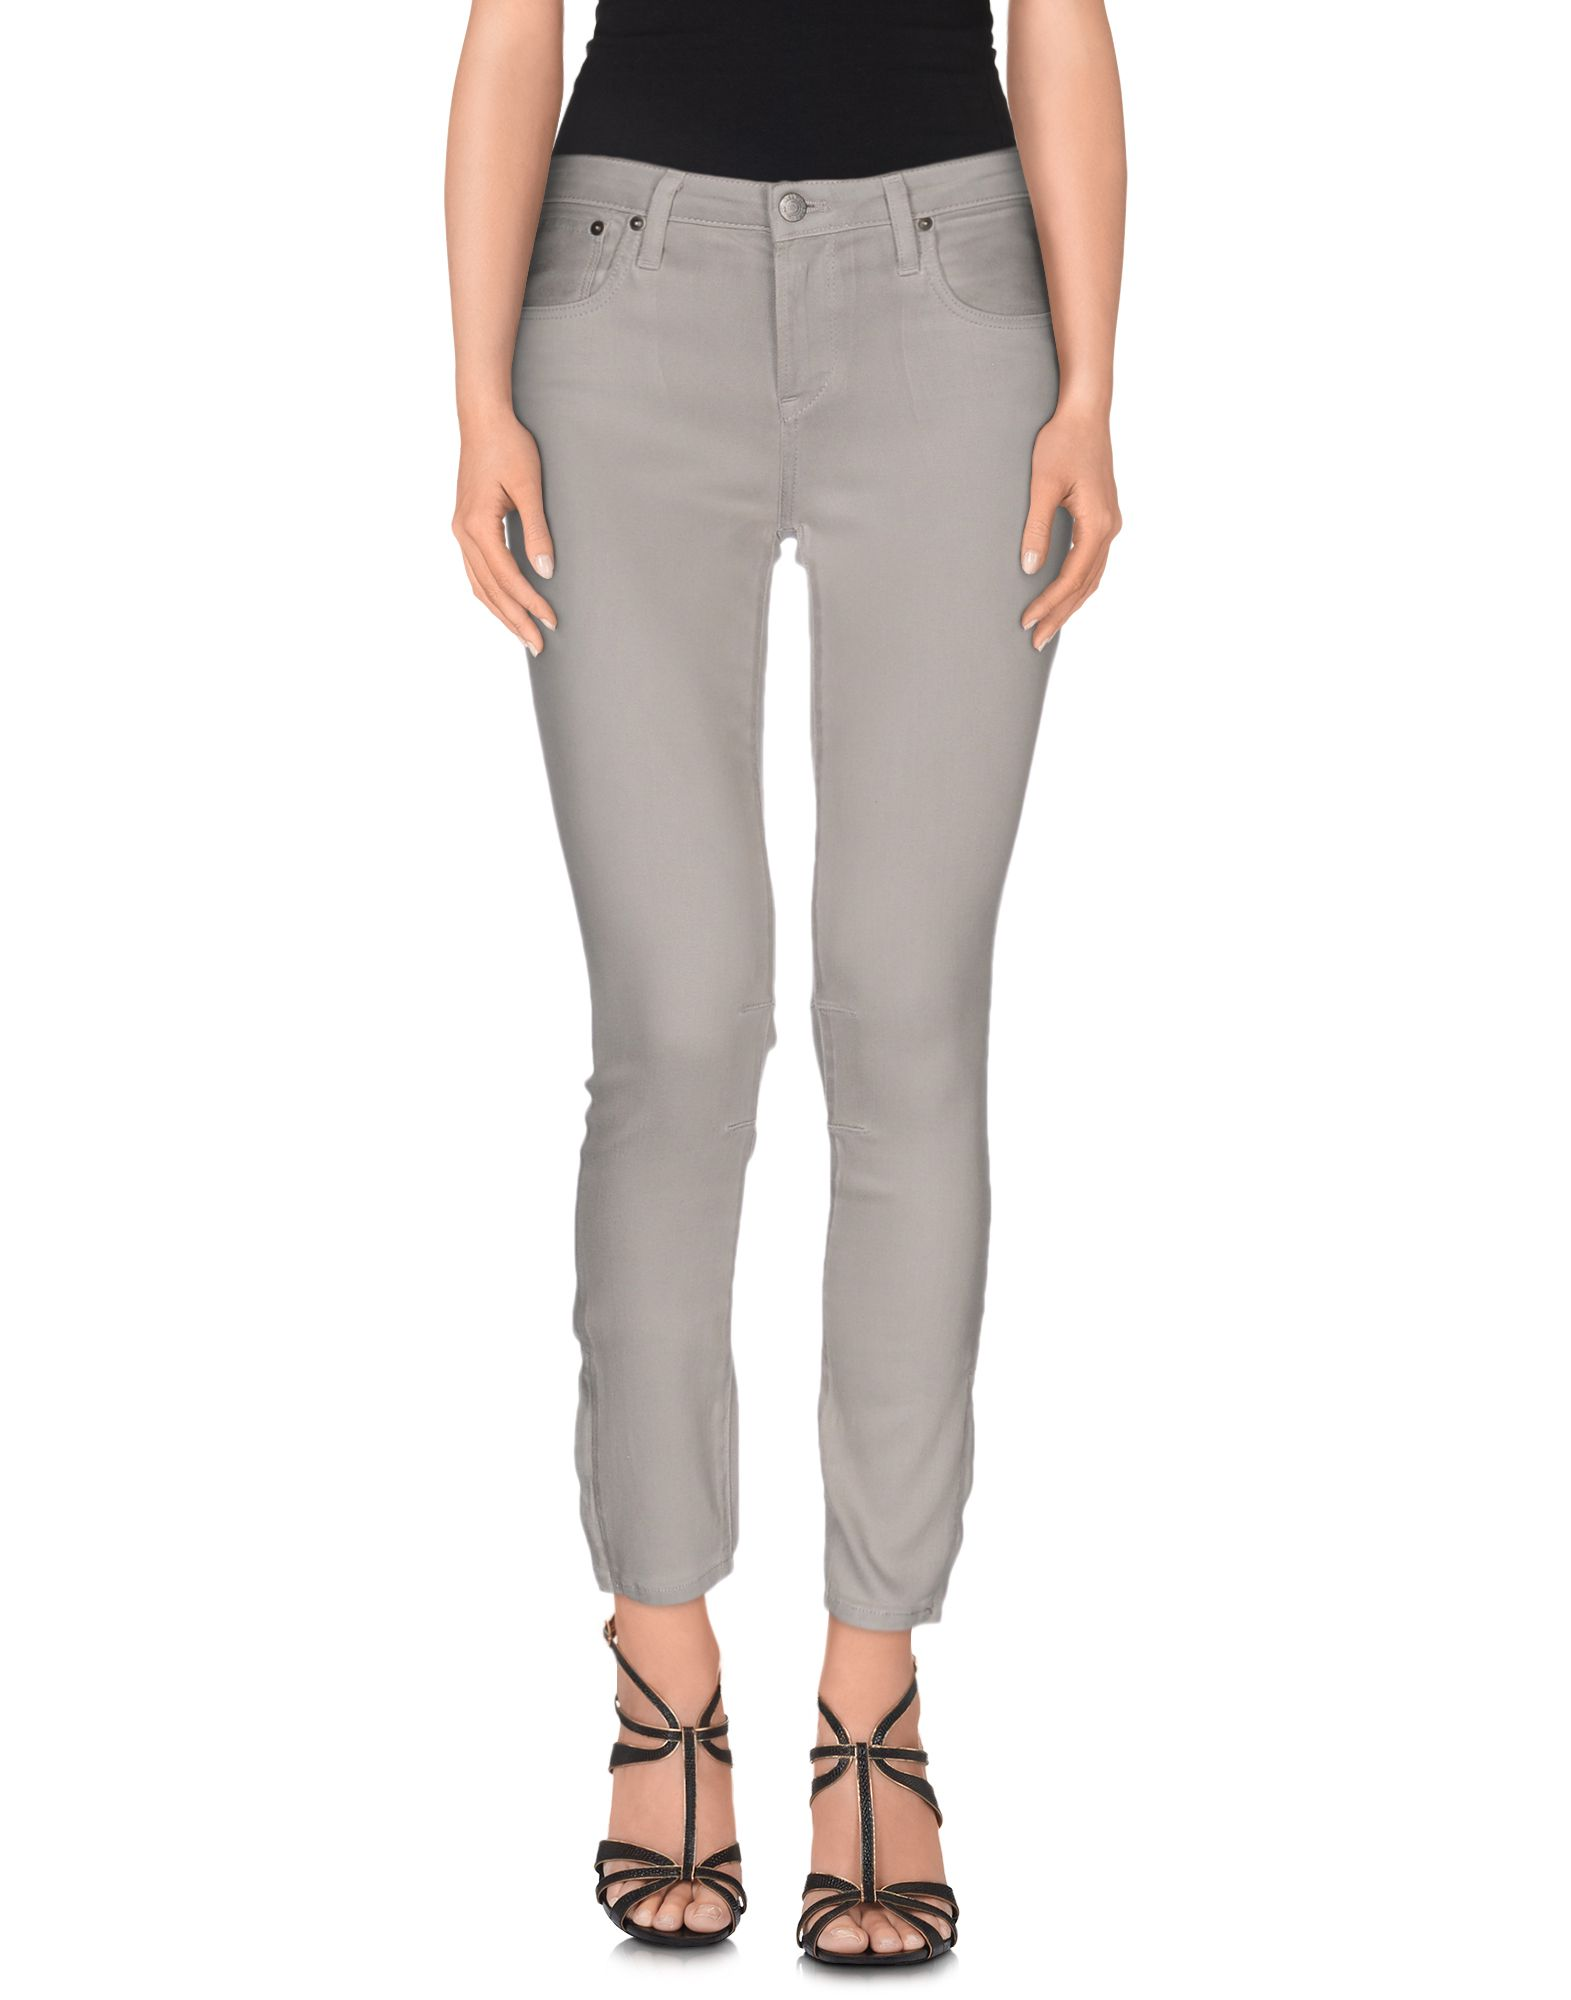 HELMUT HELMUT LANG Denim Pants in Light Grey